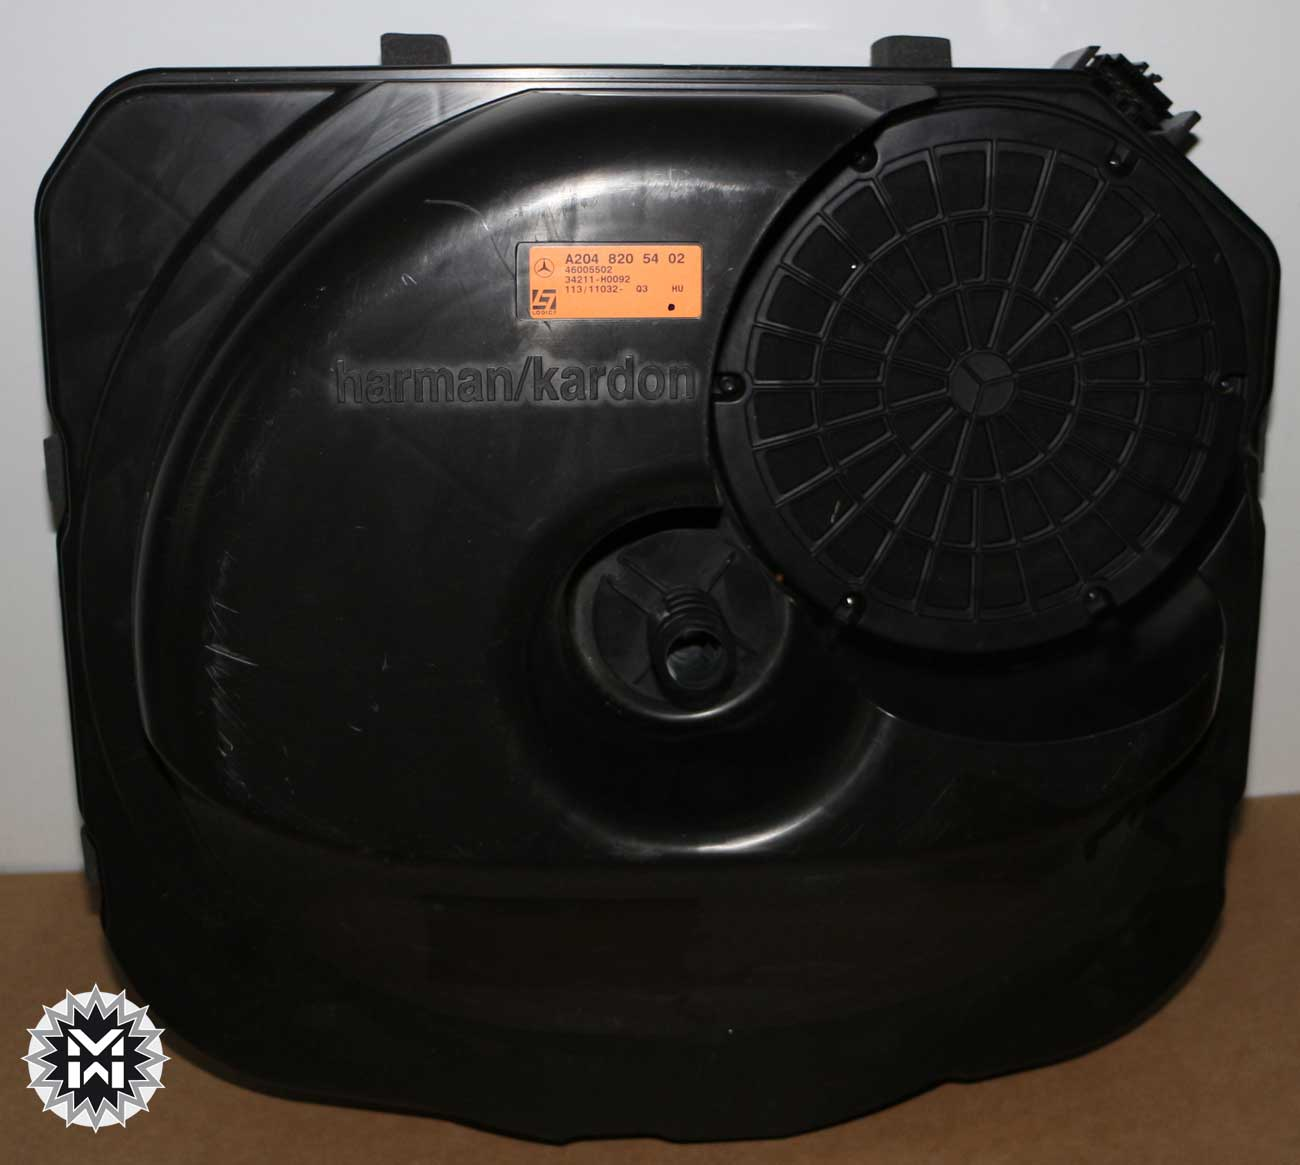 mercedes bassbox a2048205402 subwoofer lautsprecher glk. Black Bedroom Furniture Sets. Home Design Ideas